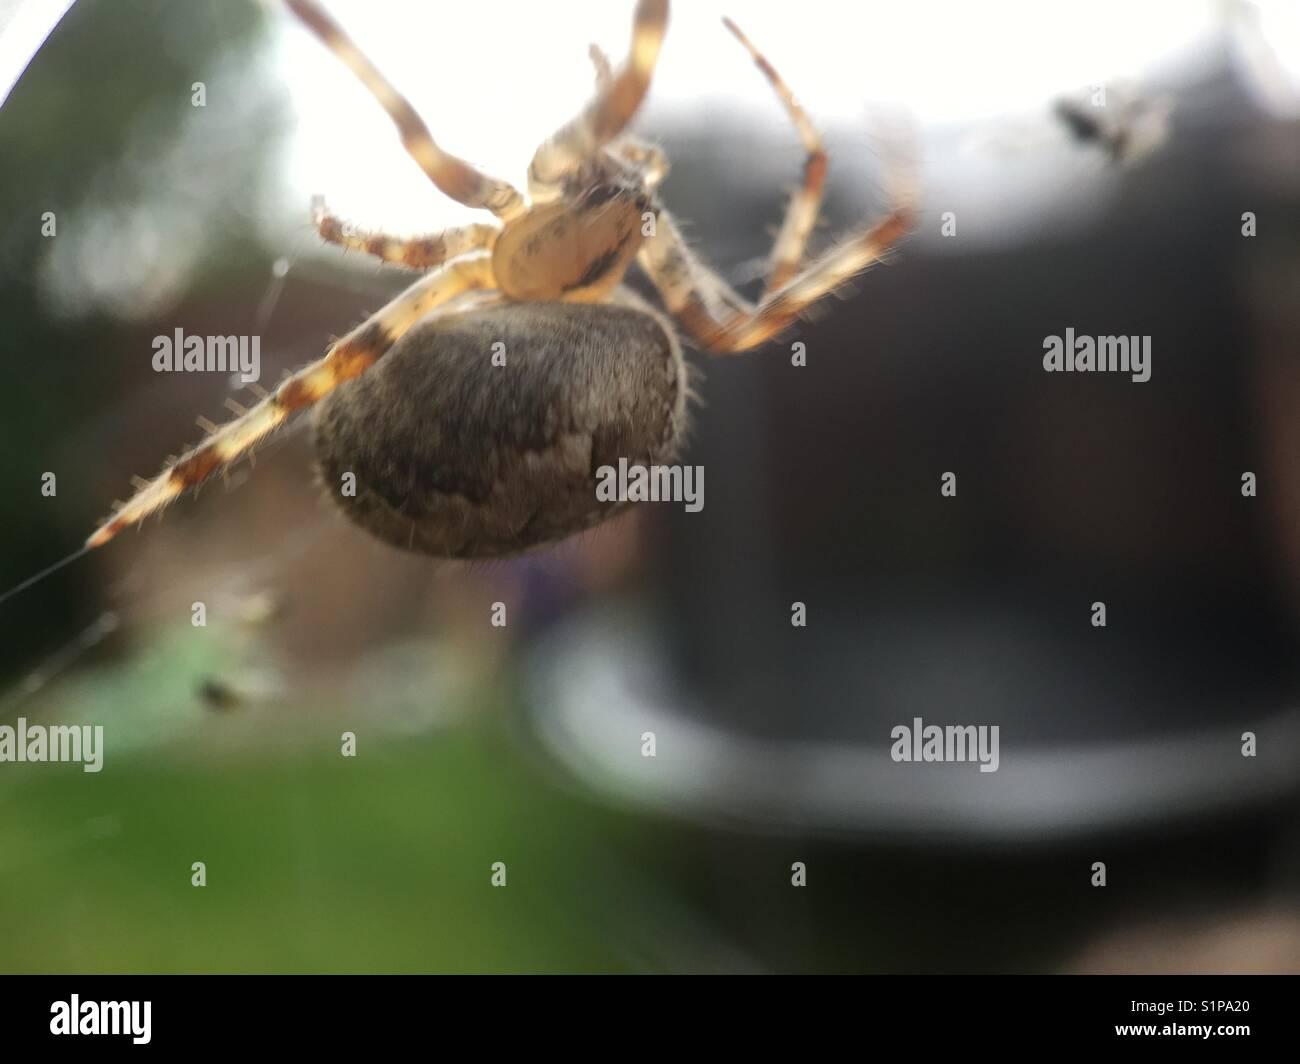 Arachnid predator - Stock Image